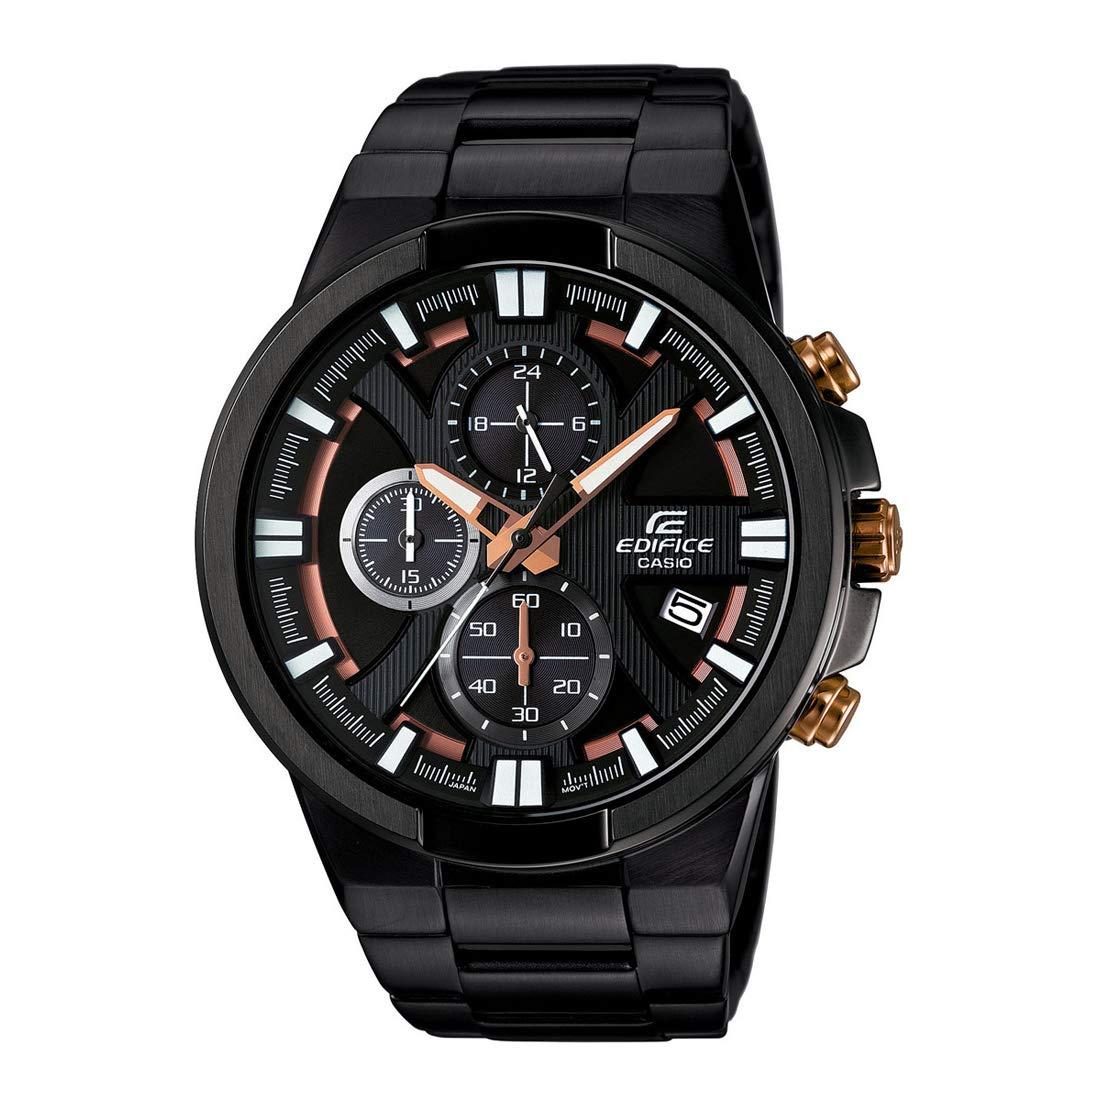 Casio Edifice Chronograph Black Dial Men's Watch - EFR-544BK-1A9VUDF (EX230)